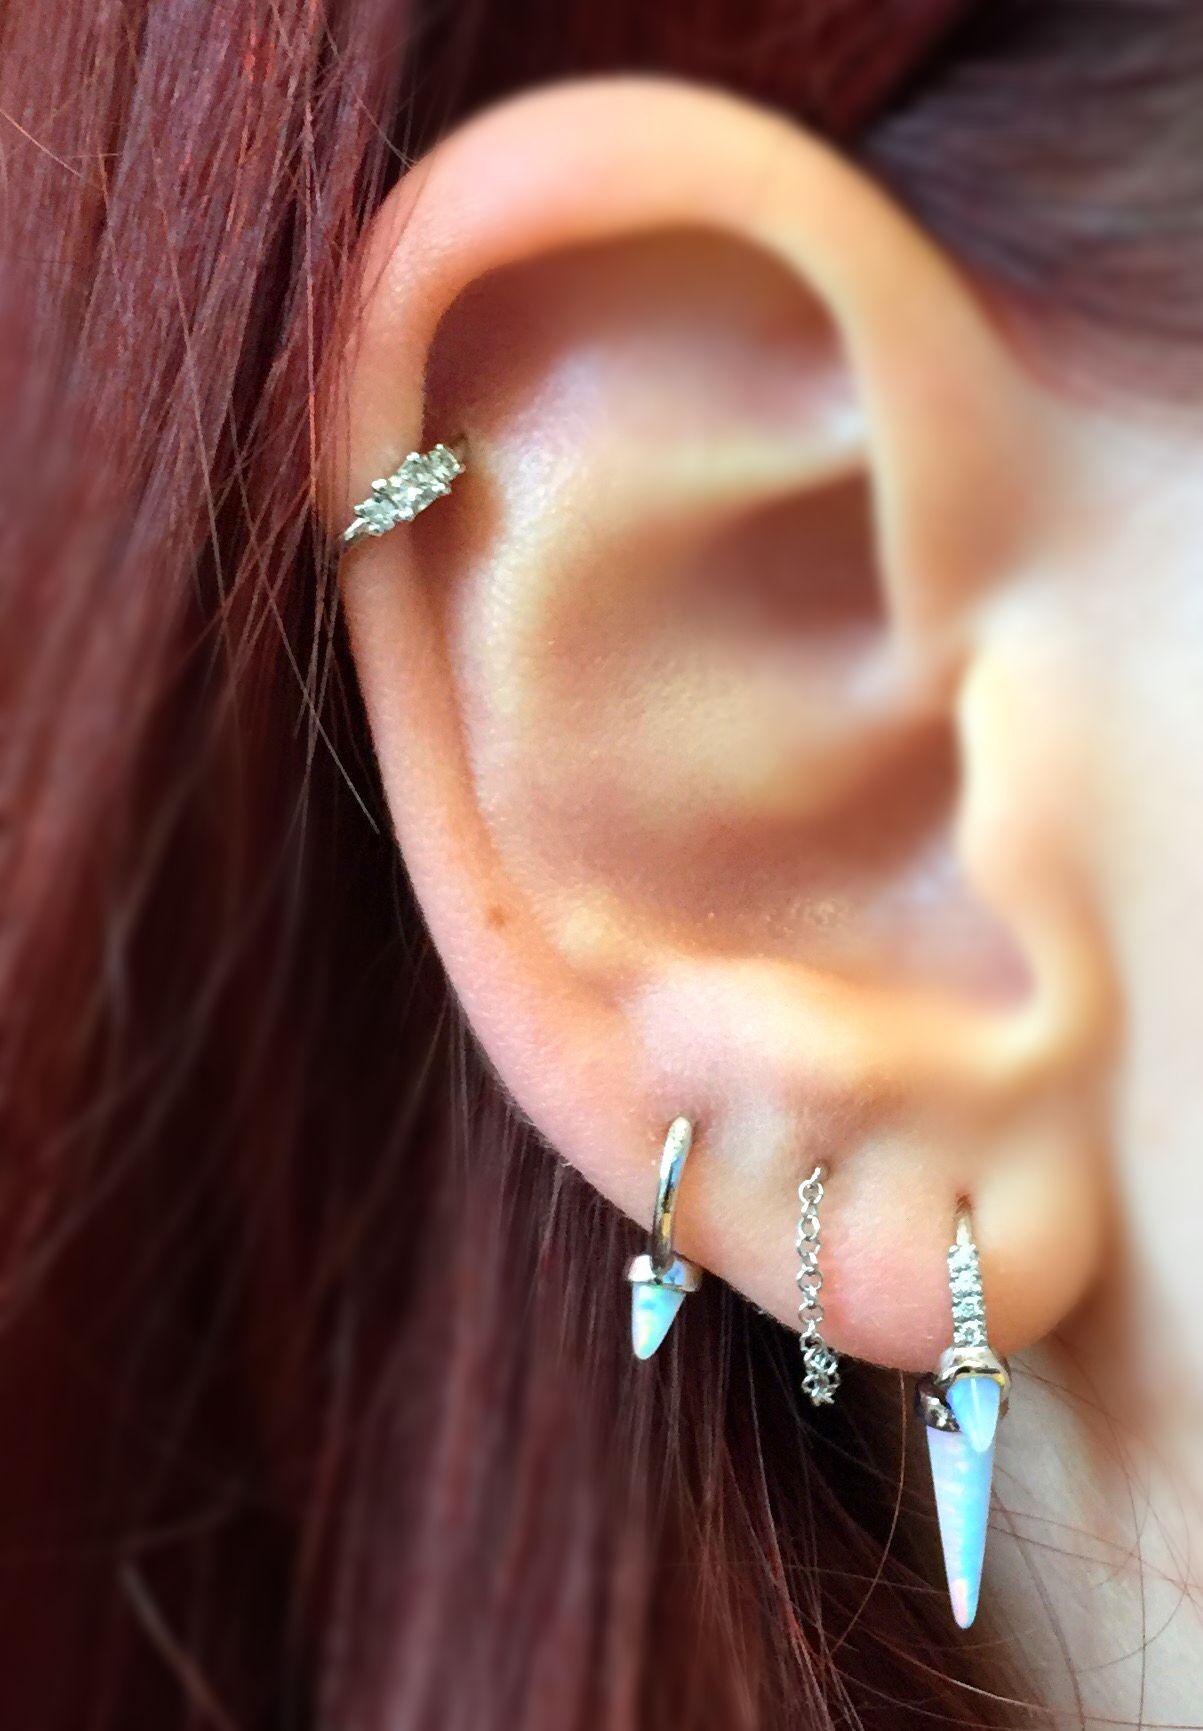 Venus By Maria Tash Helix Ear Piercing White Opal Amazing